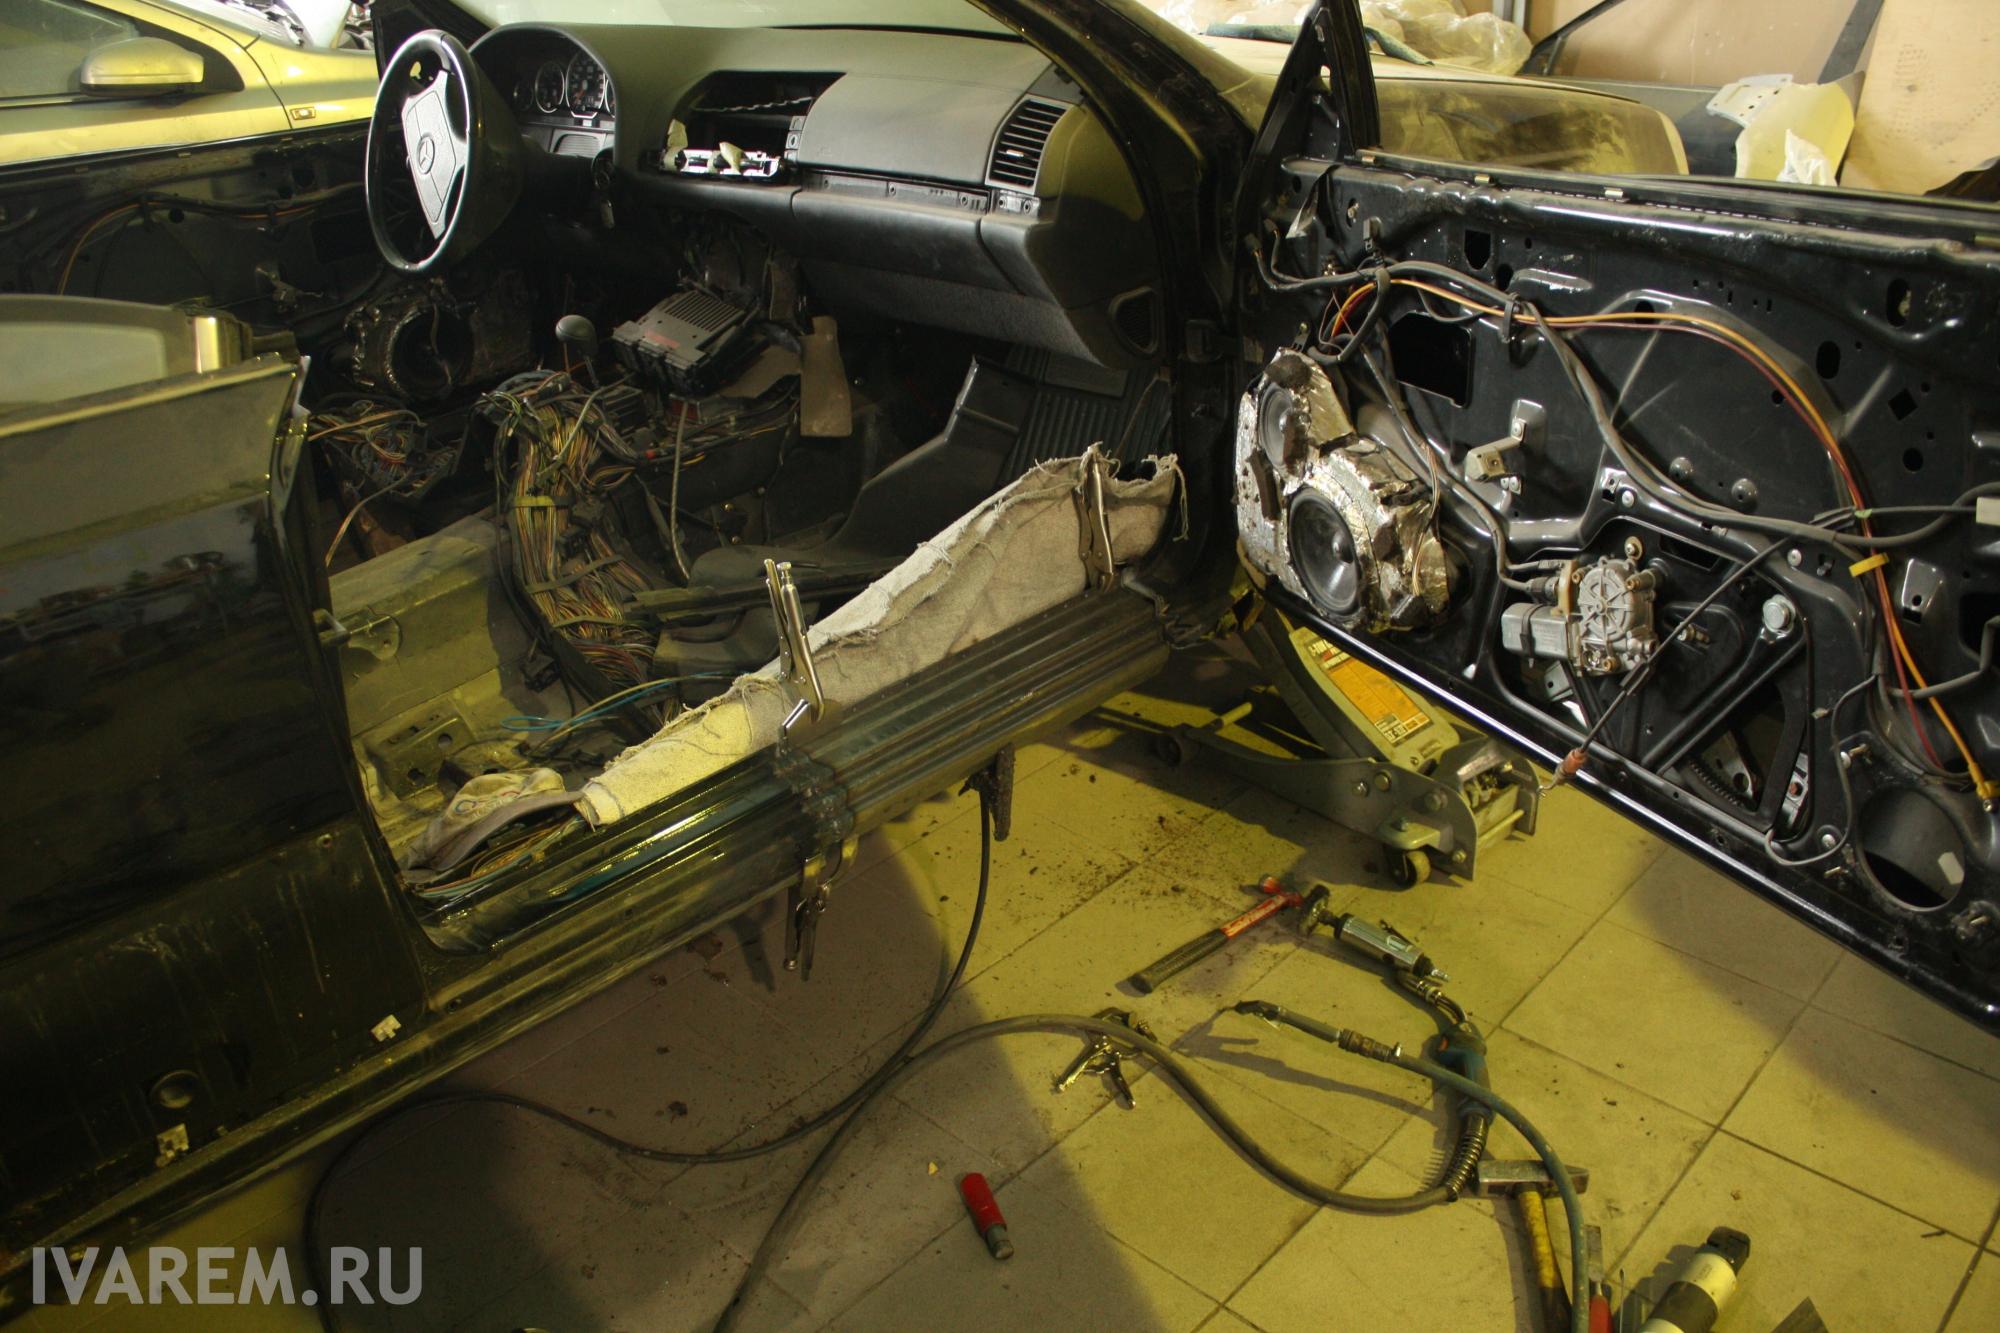 Mercedes Benz W140 Coupe полная реставрация кузова и салона. mercedes, mercedes-benz, w140, авто, ремонт кузова, ремонт салона